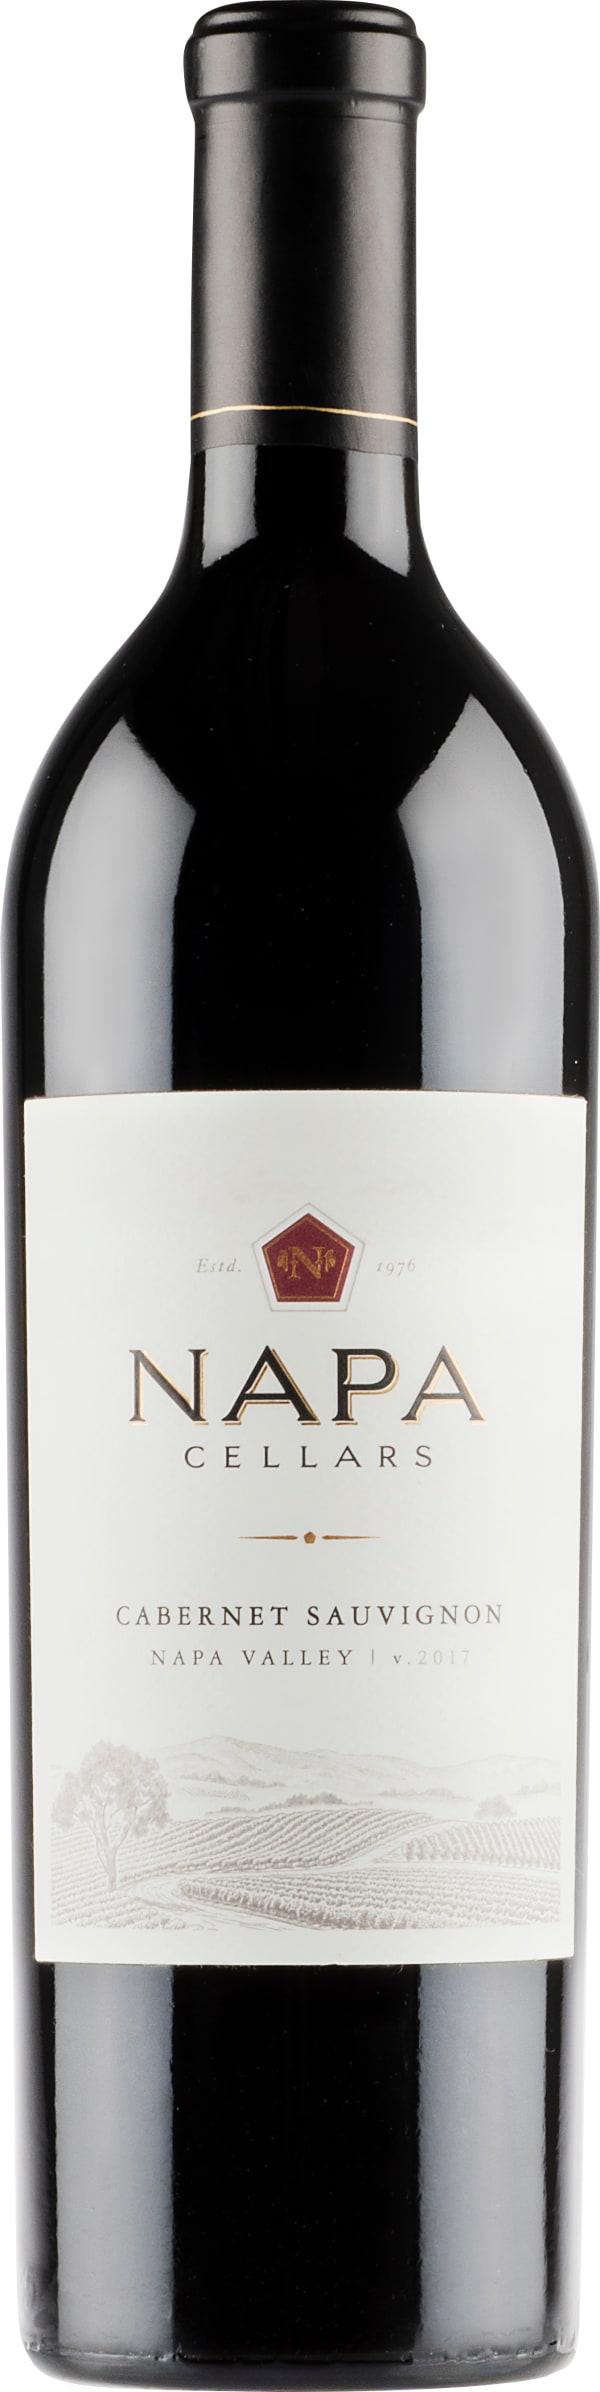 Napa Cellars Cabernet Sauvignon 2017